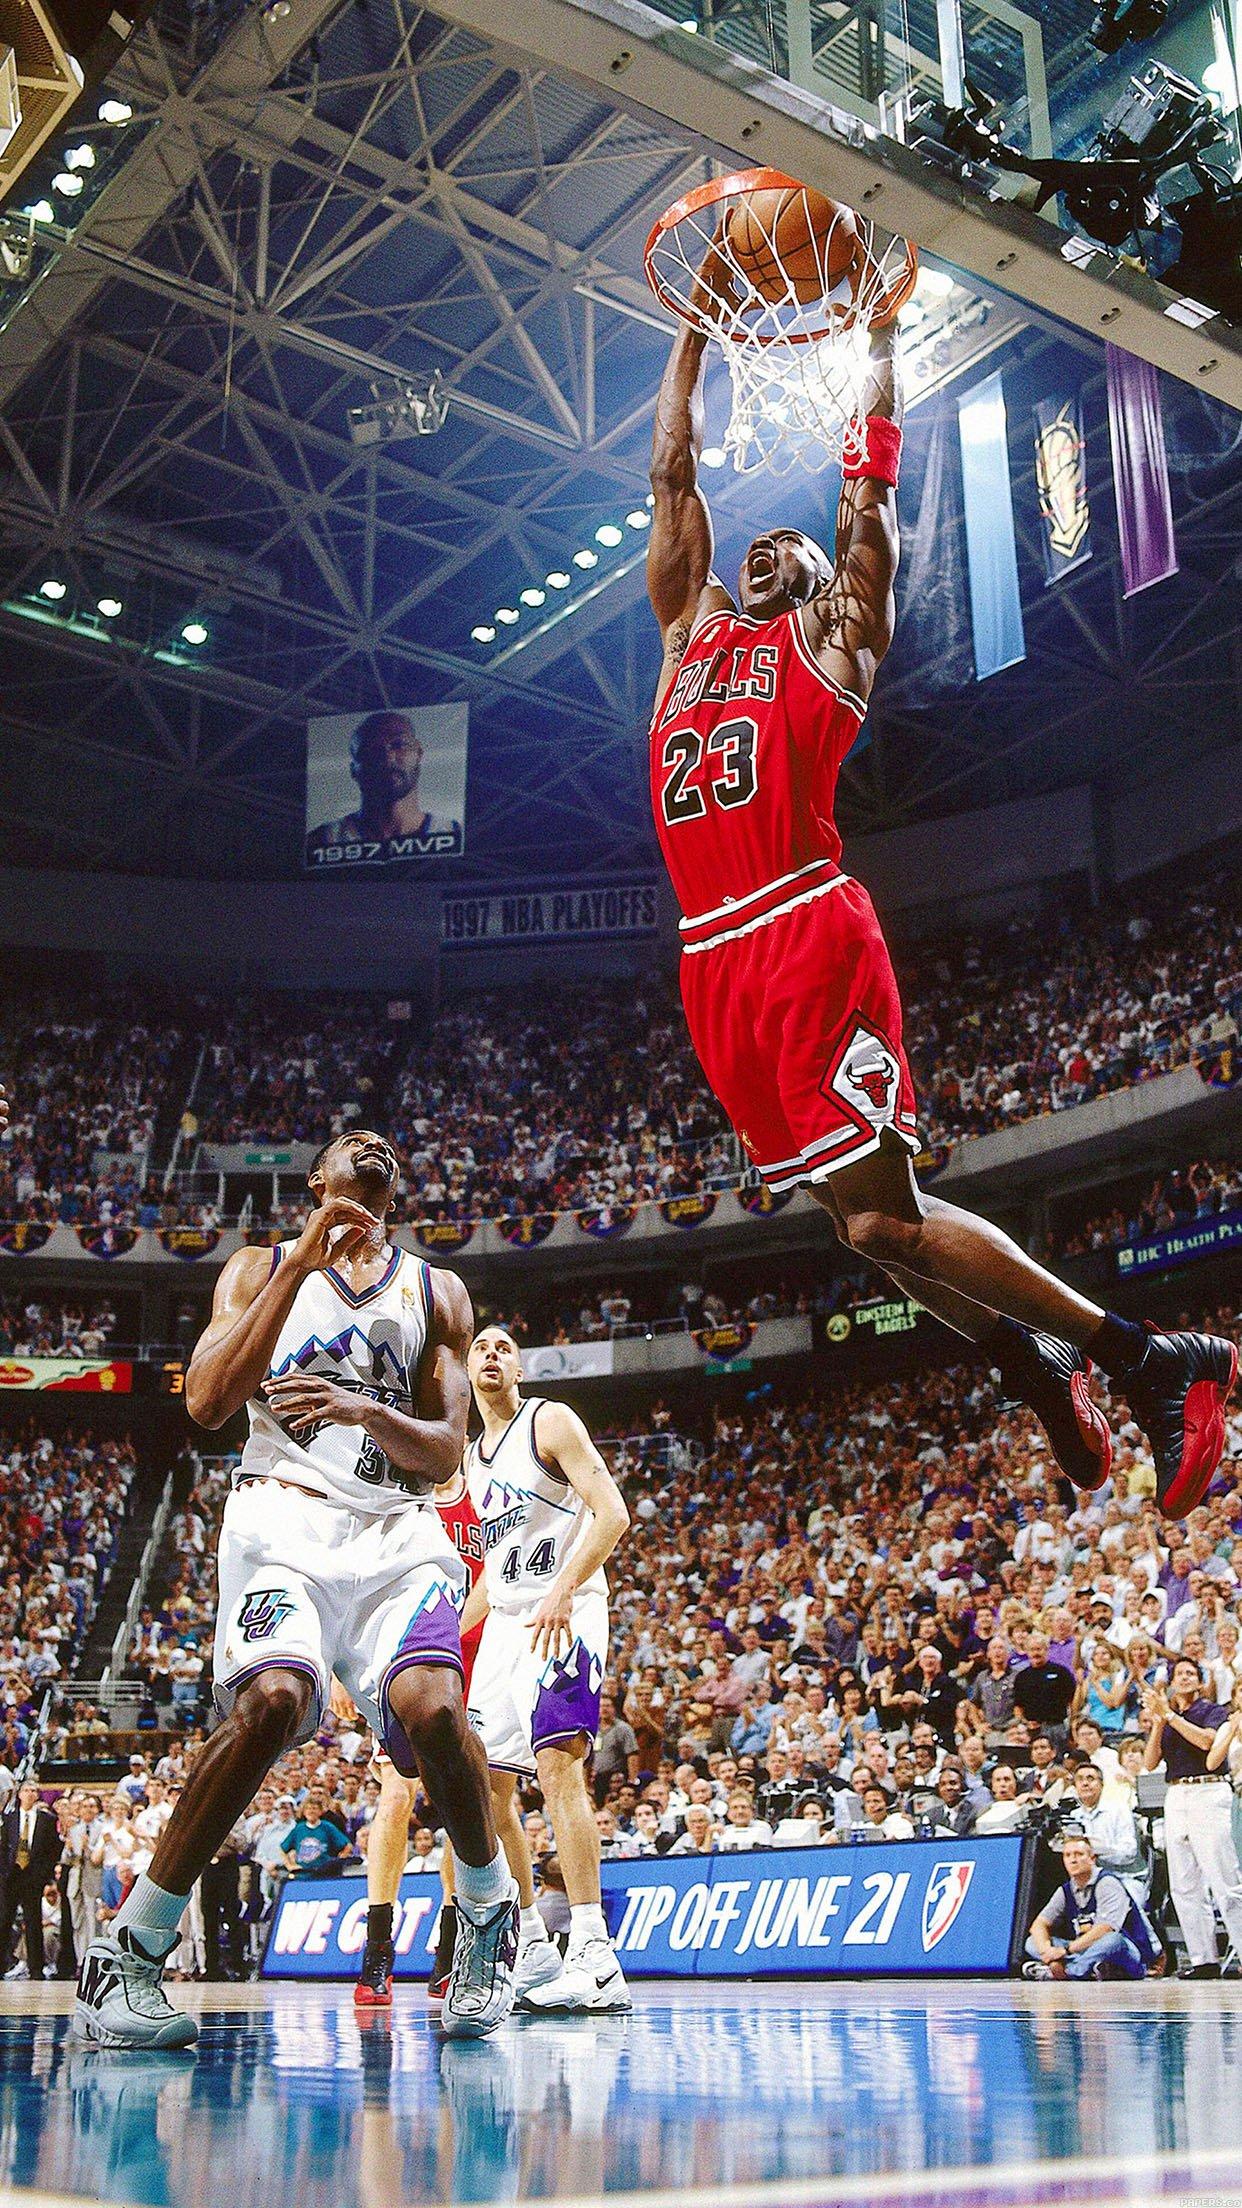 Michael Jordan Iphone 5 Wallpaper Posted By Sarah Peltier